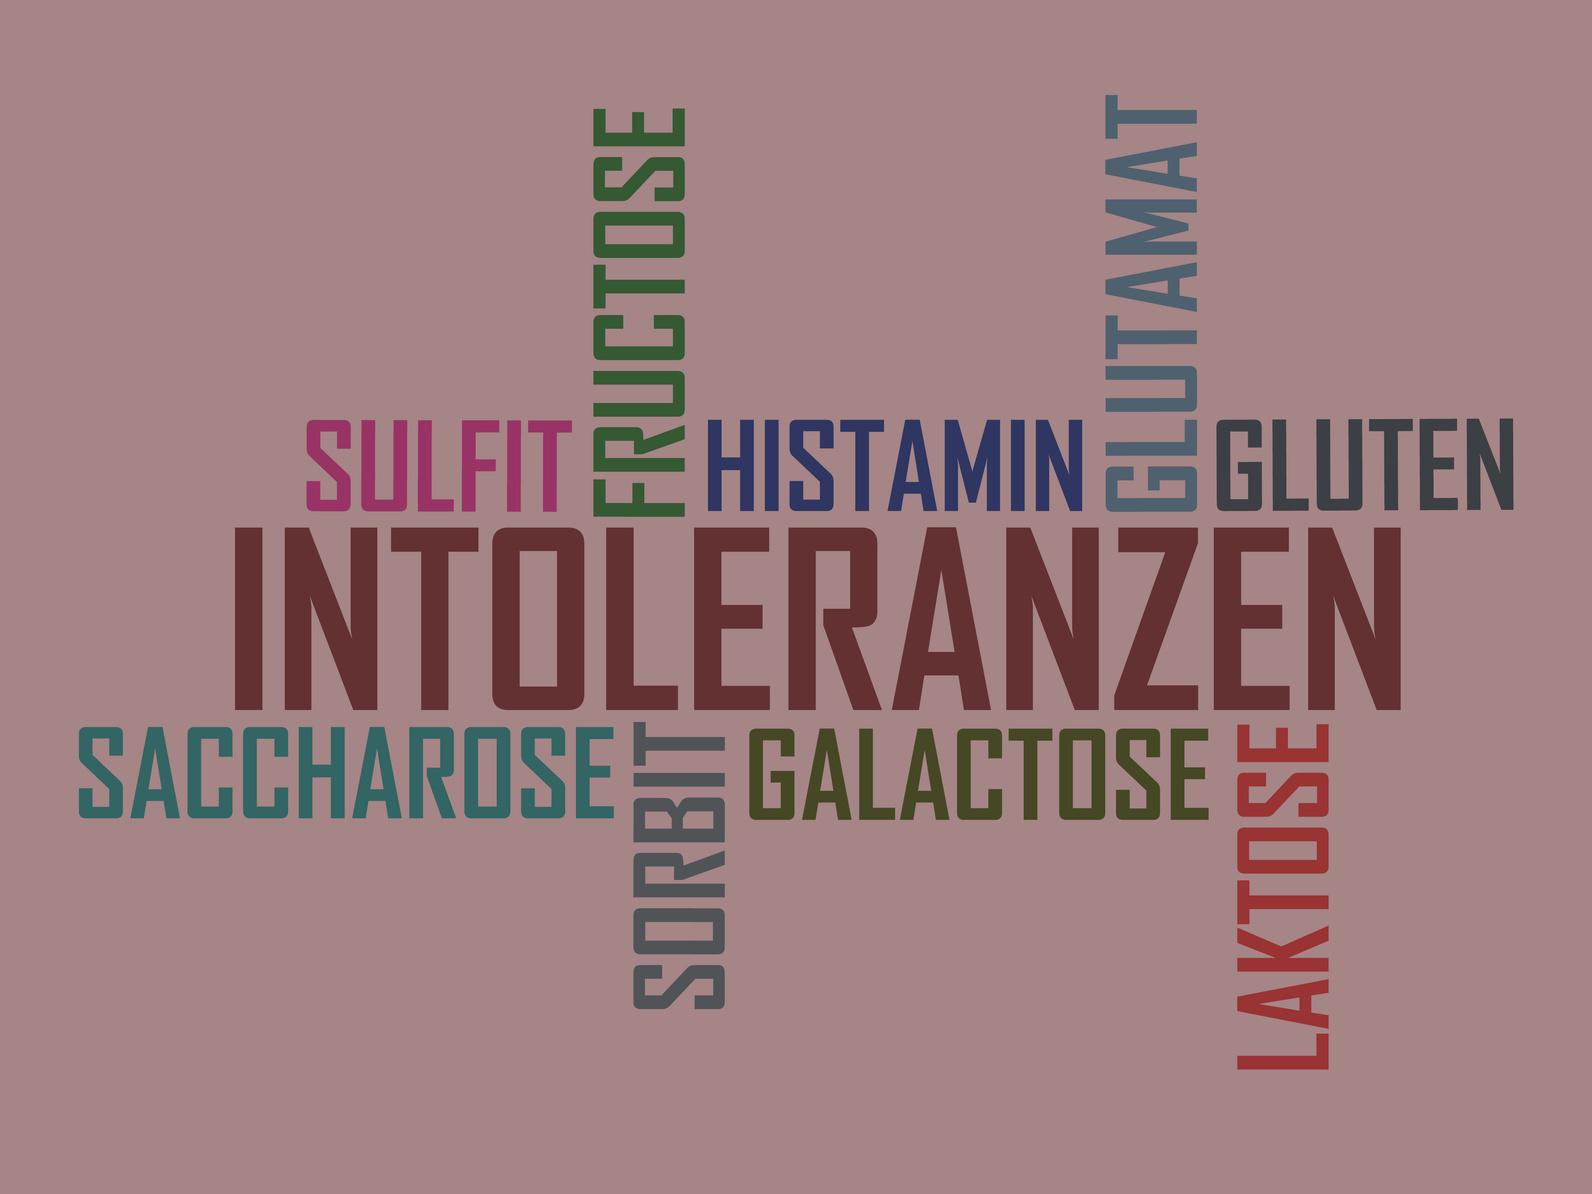 Intoleranzen